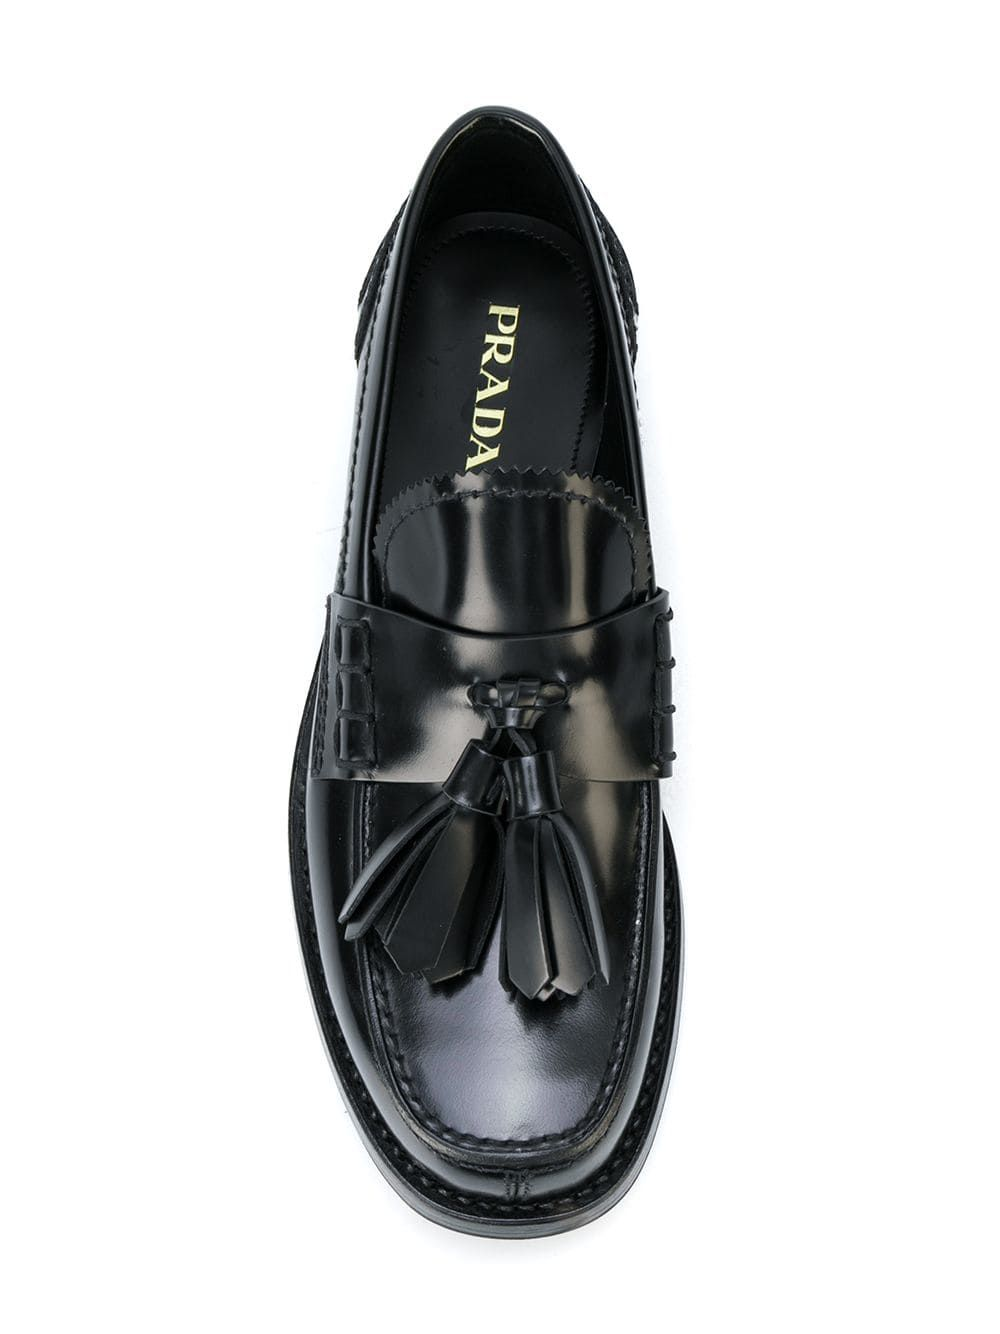 38e27c1a Prada tassel front loafers | BUY in 2019 | Loafers, Prada, Hermes ring